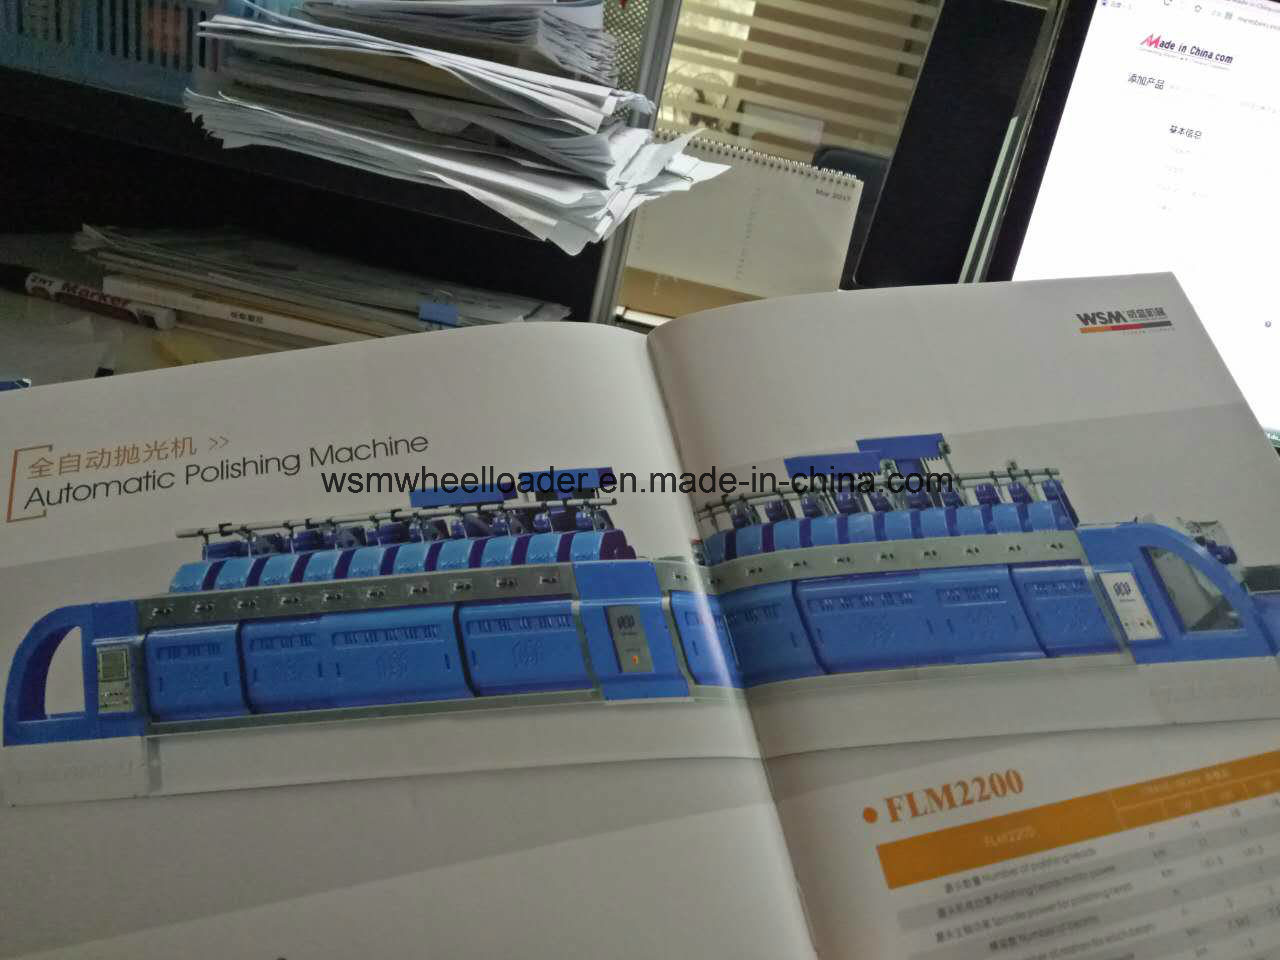 20 Head Automatic Polishing Machine